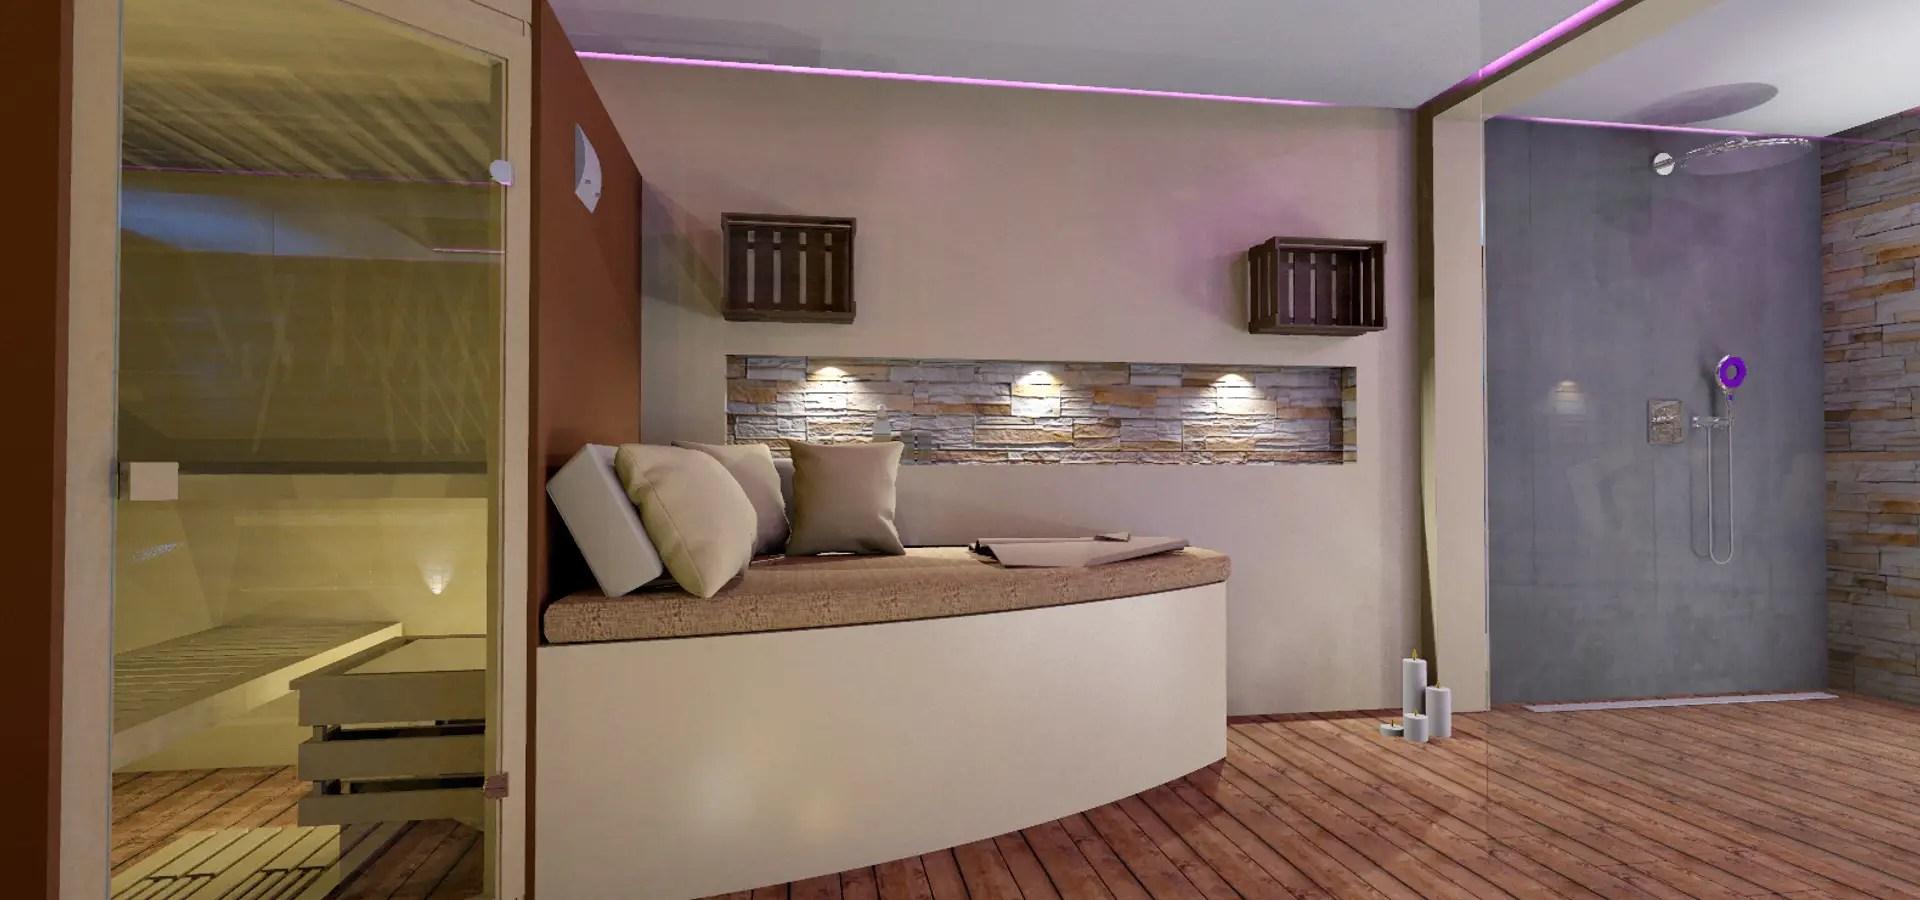 sauna ruheraum gestalten wellness saunawelt kinderhotel almhof. Black Bedroom Furniture Sets. Home Design Ideas